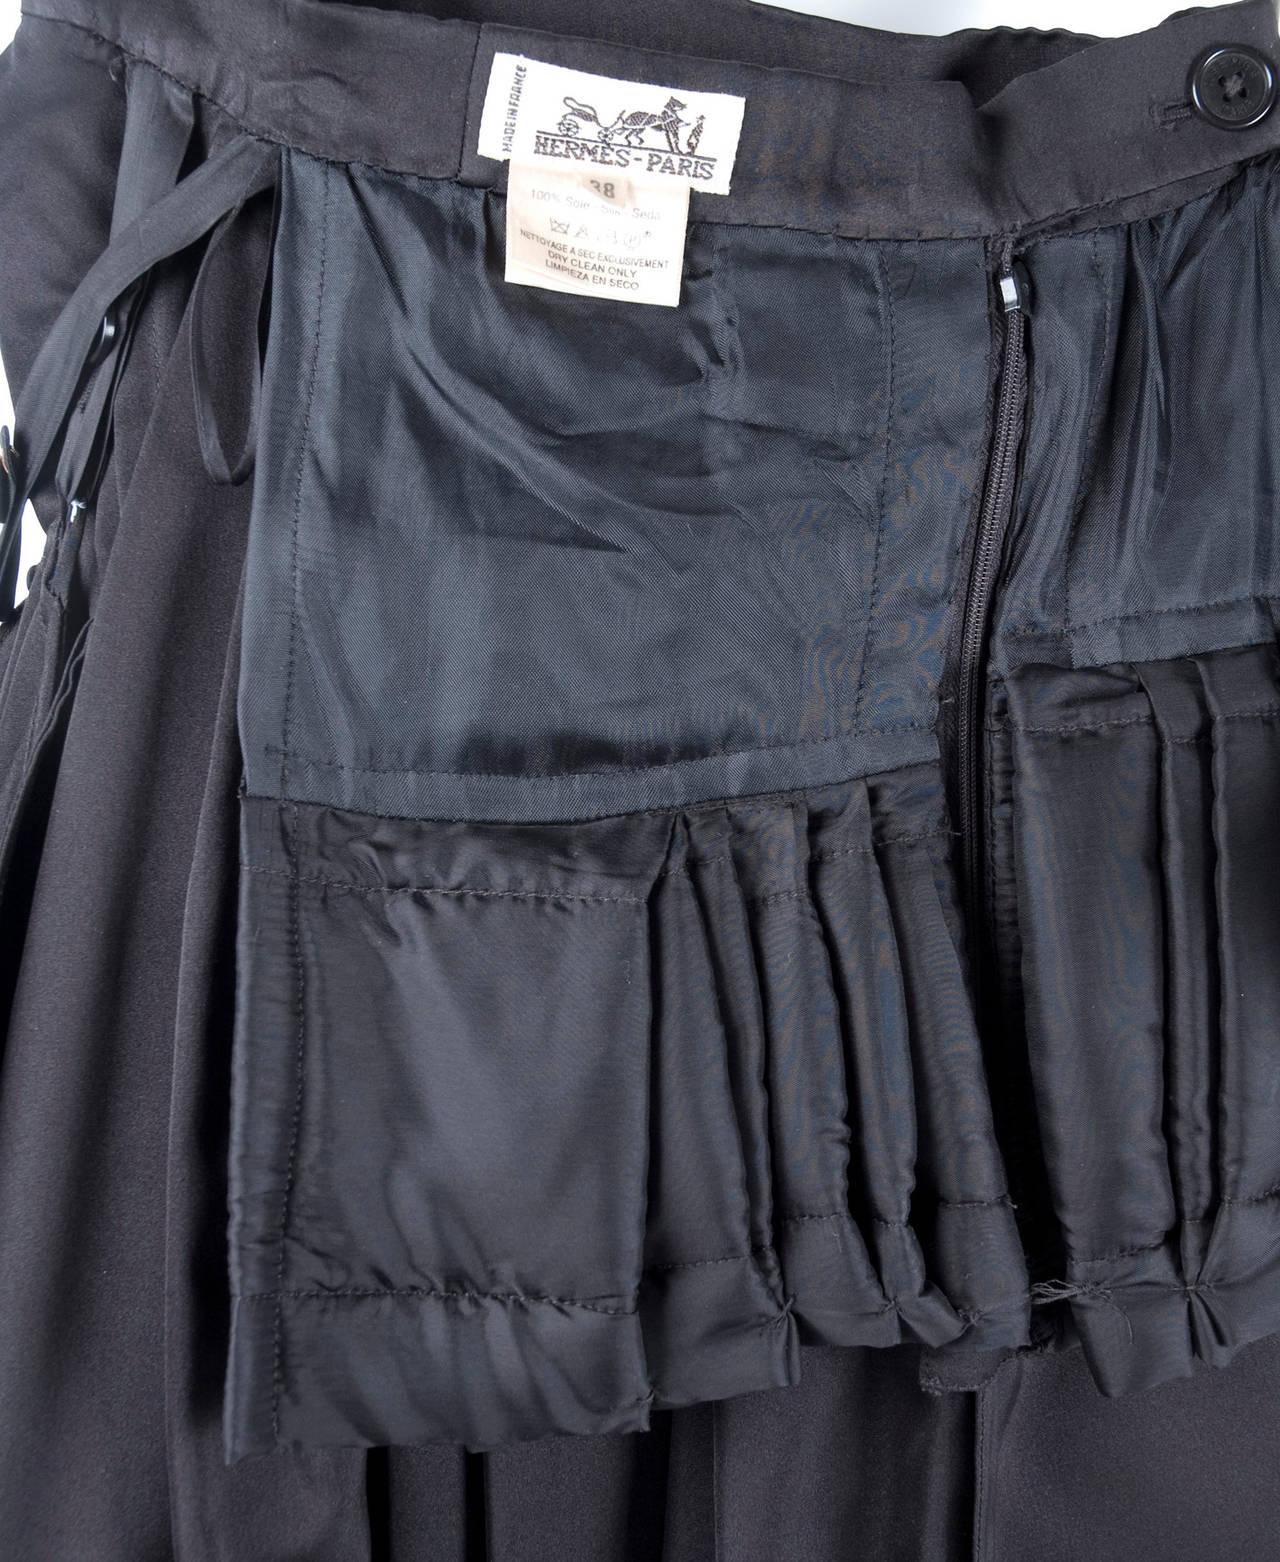 Rare Vintage HERMES Asymetrical Evening Skirt in Black Silk 8